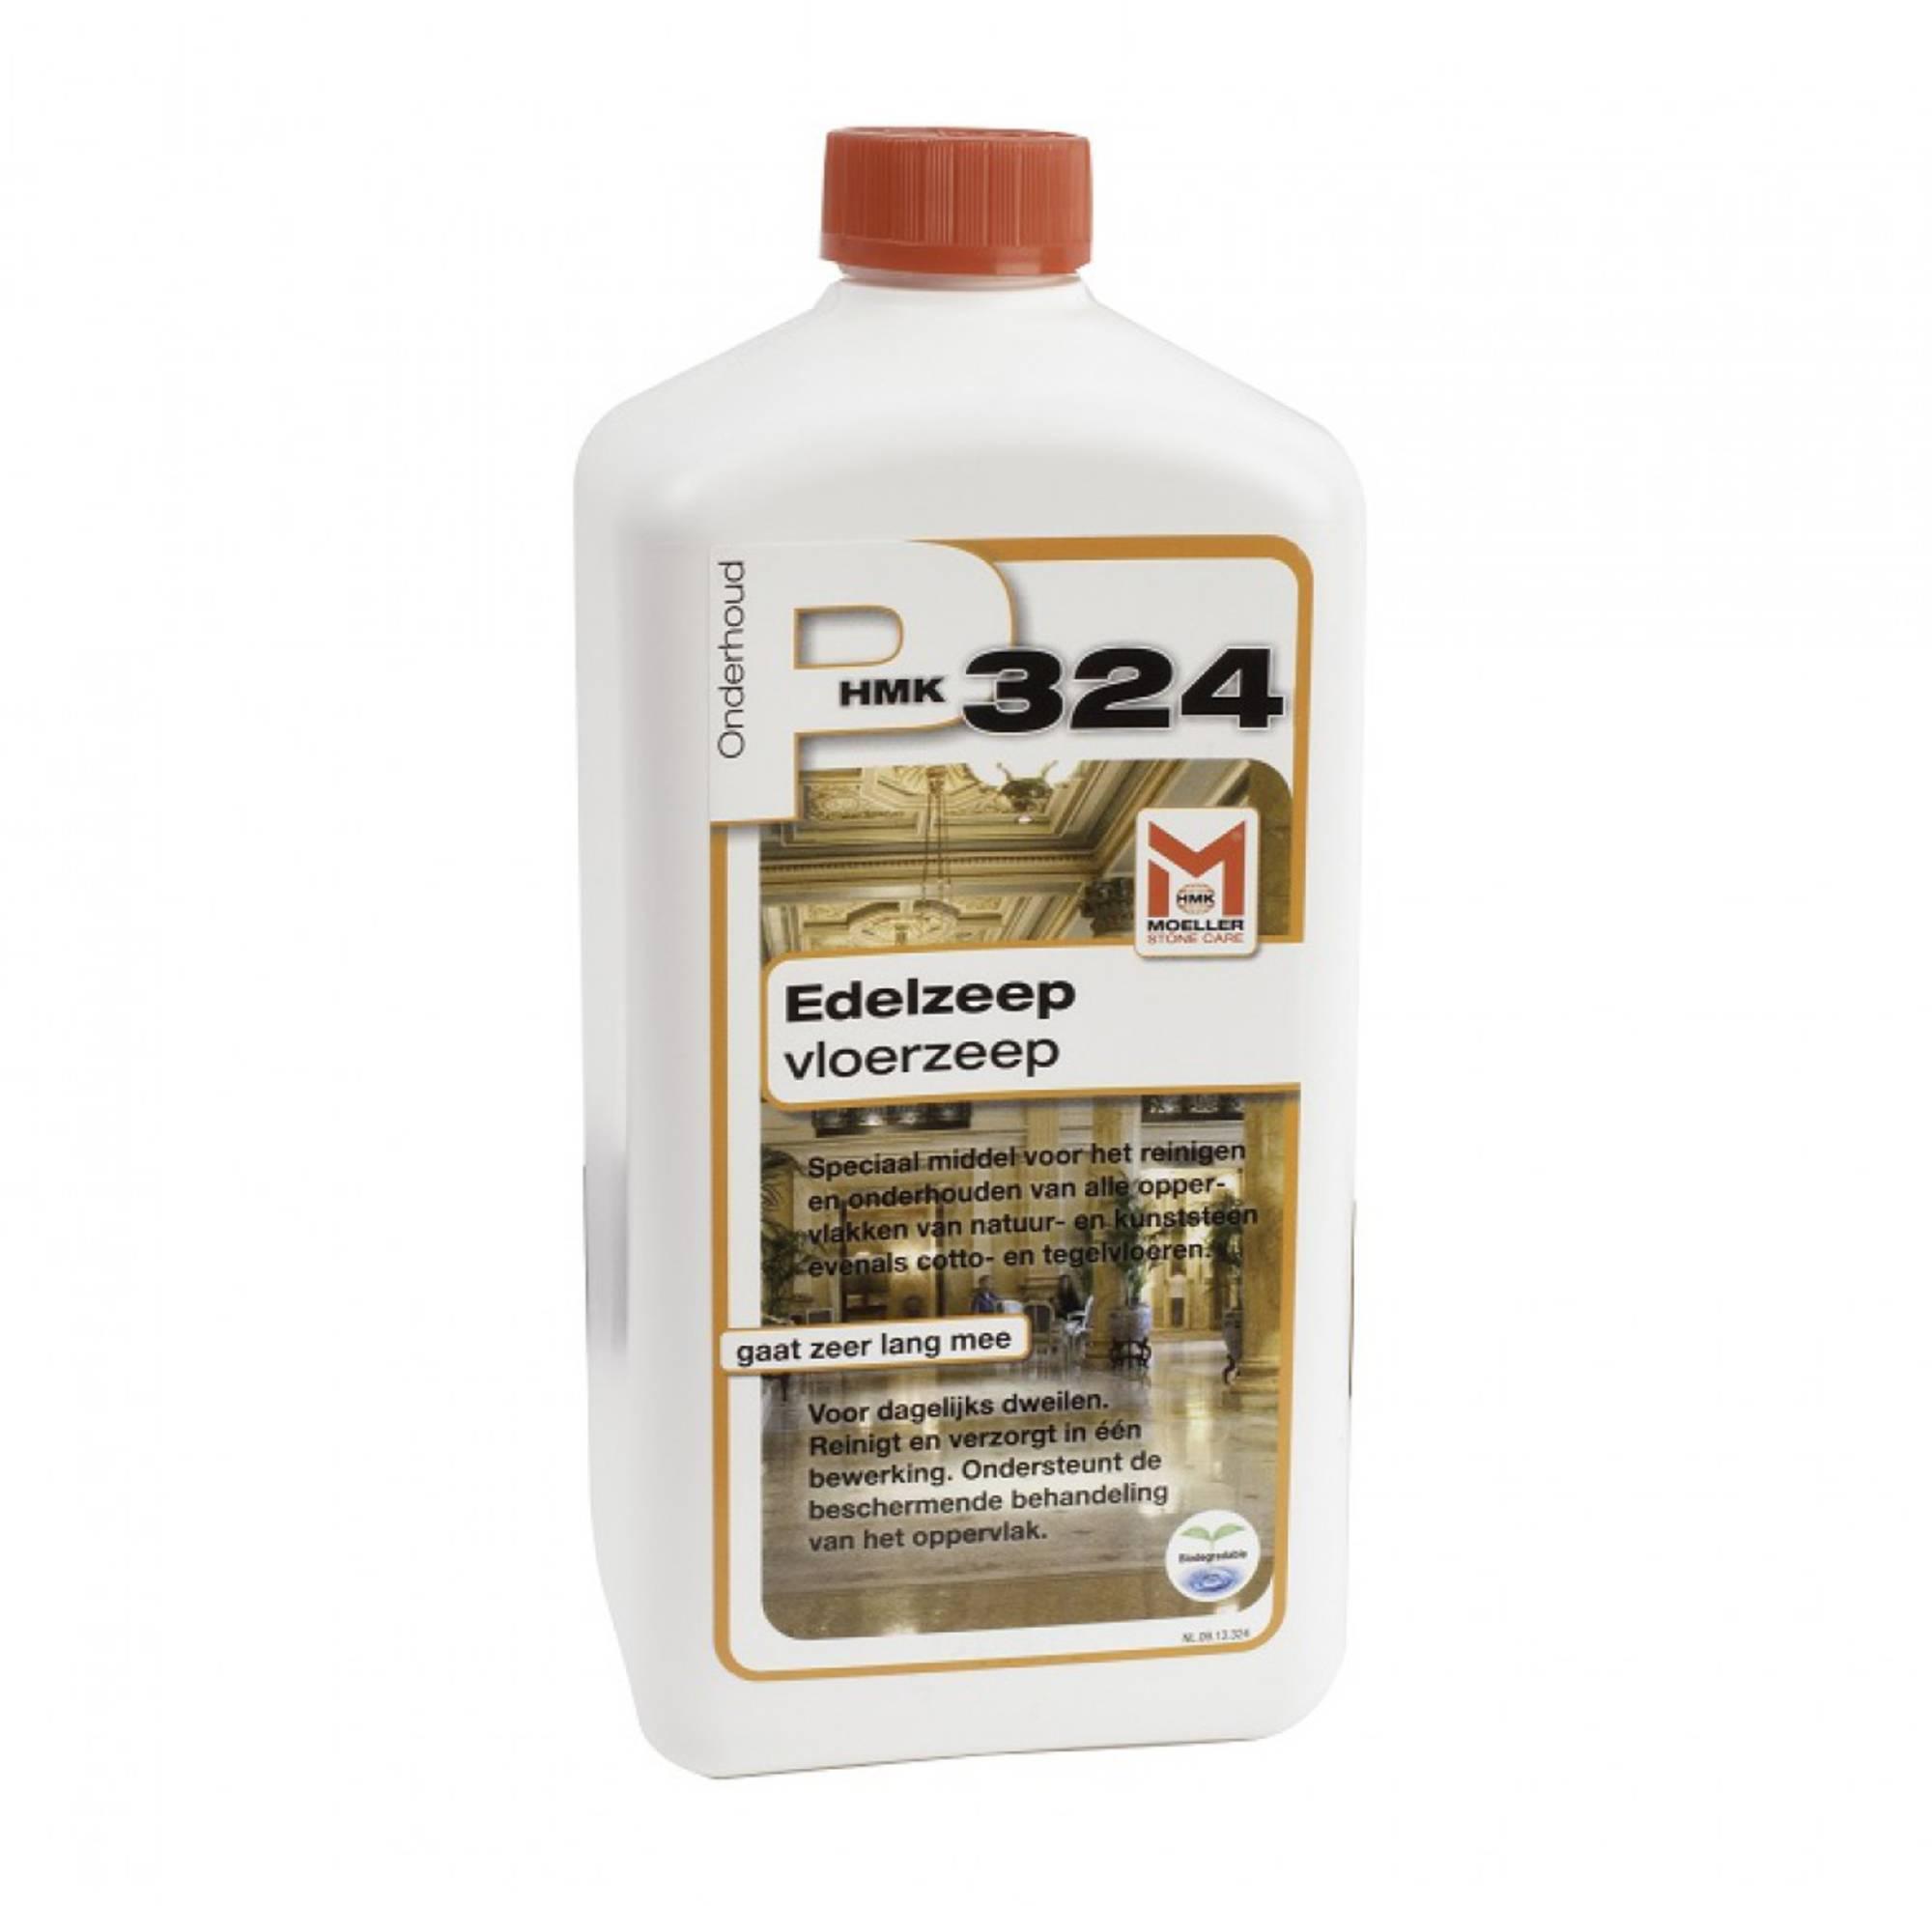 Dagaanbieding - HMK P324 Edelzeep - vloerzeep 1 liter dagelijkse koopjes